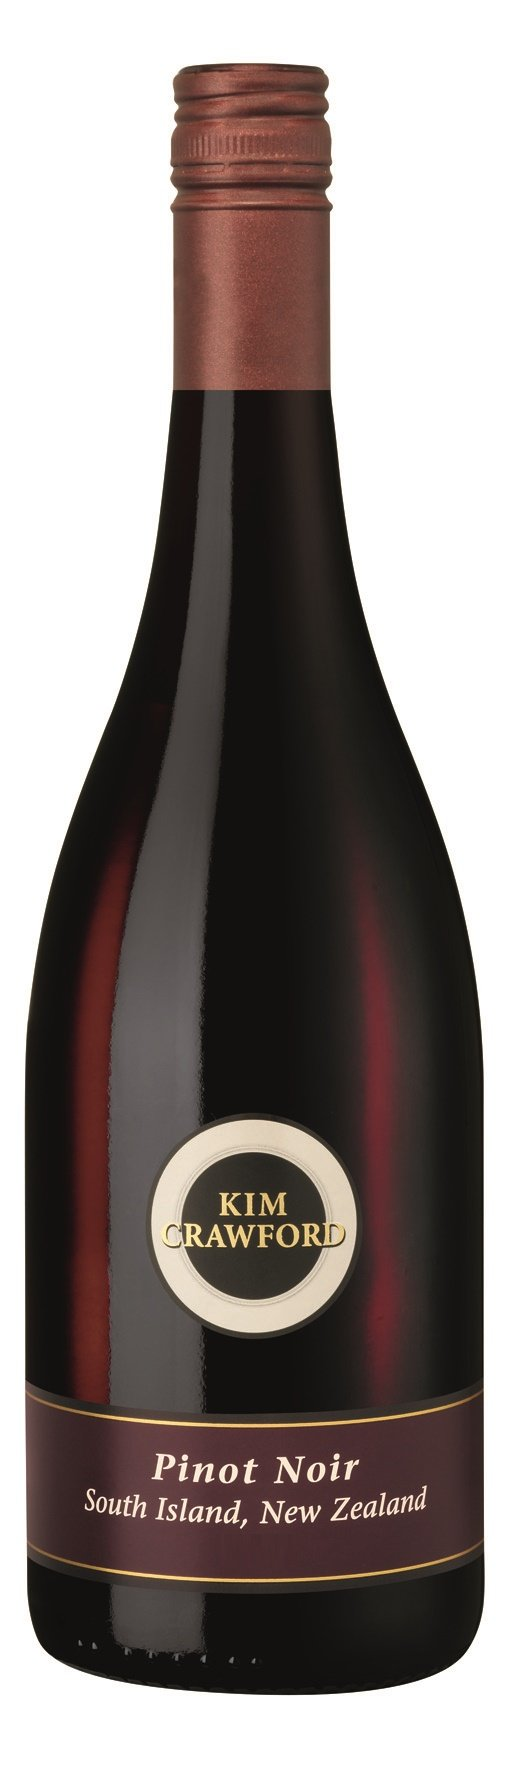 6x-075l-2015er-Kim-Crawford-Pinot-Noir-South-Island-Neuseeland-Rotwein-trocken